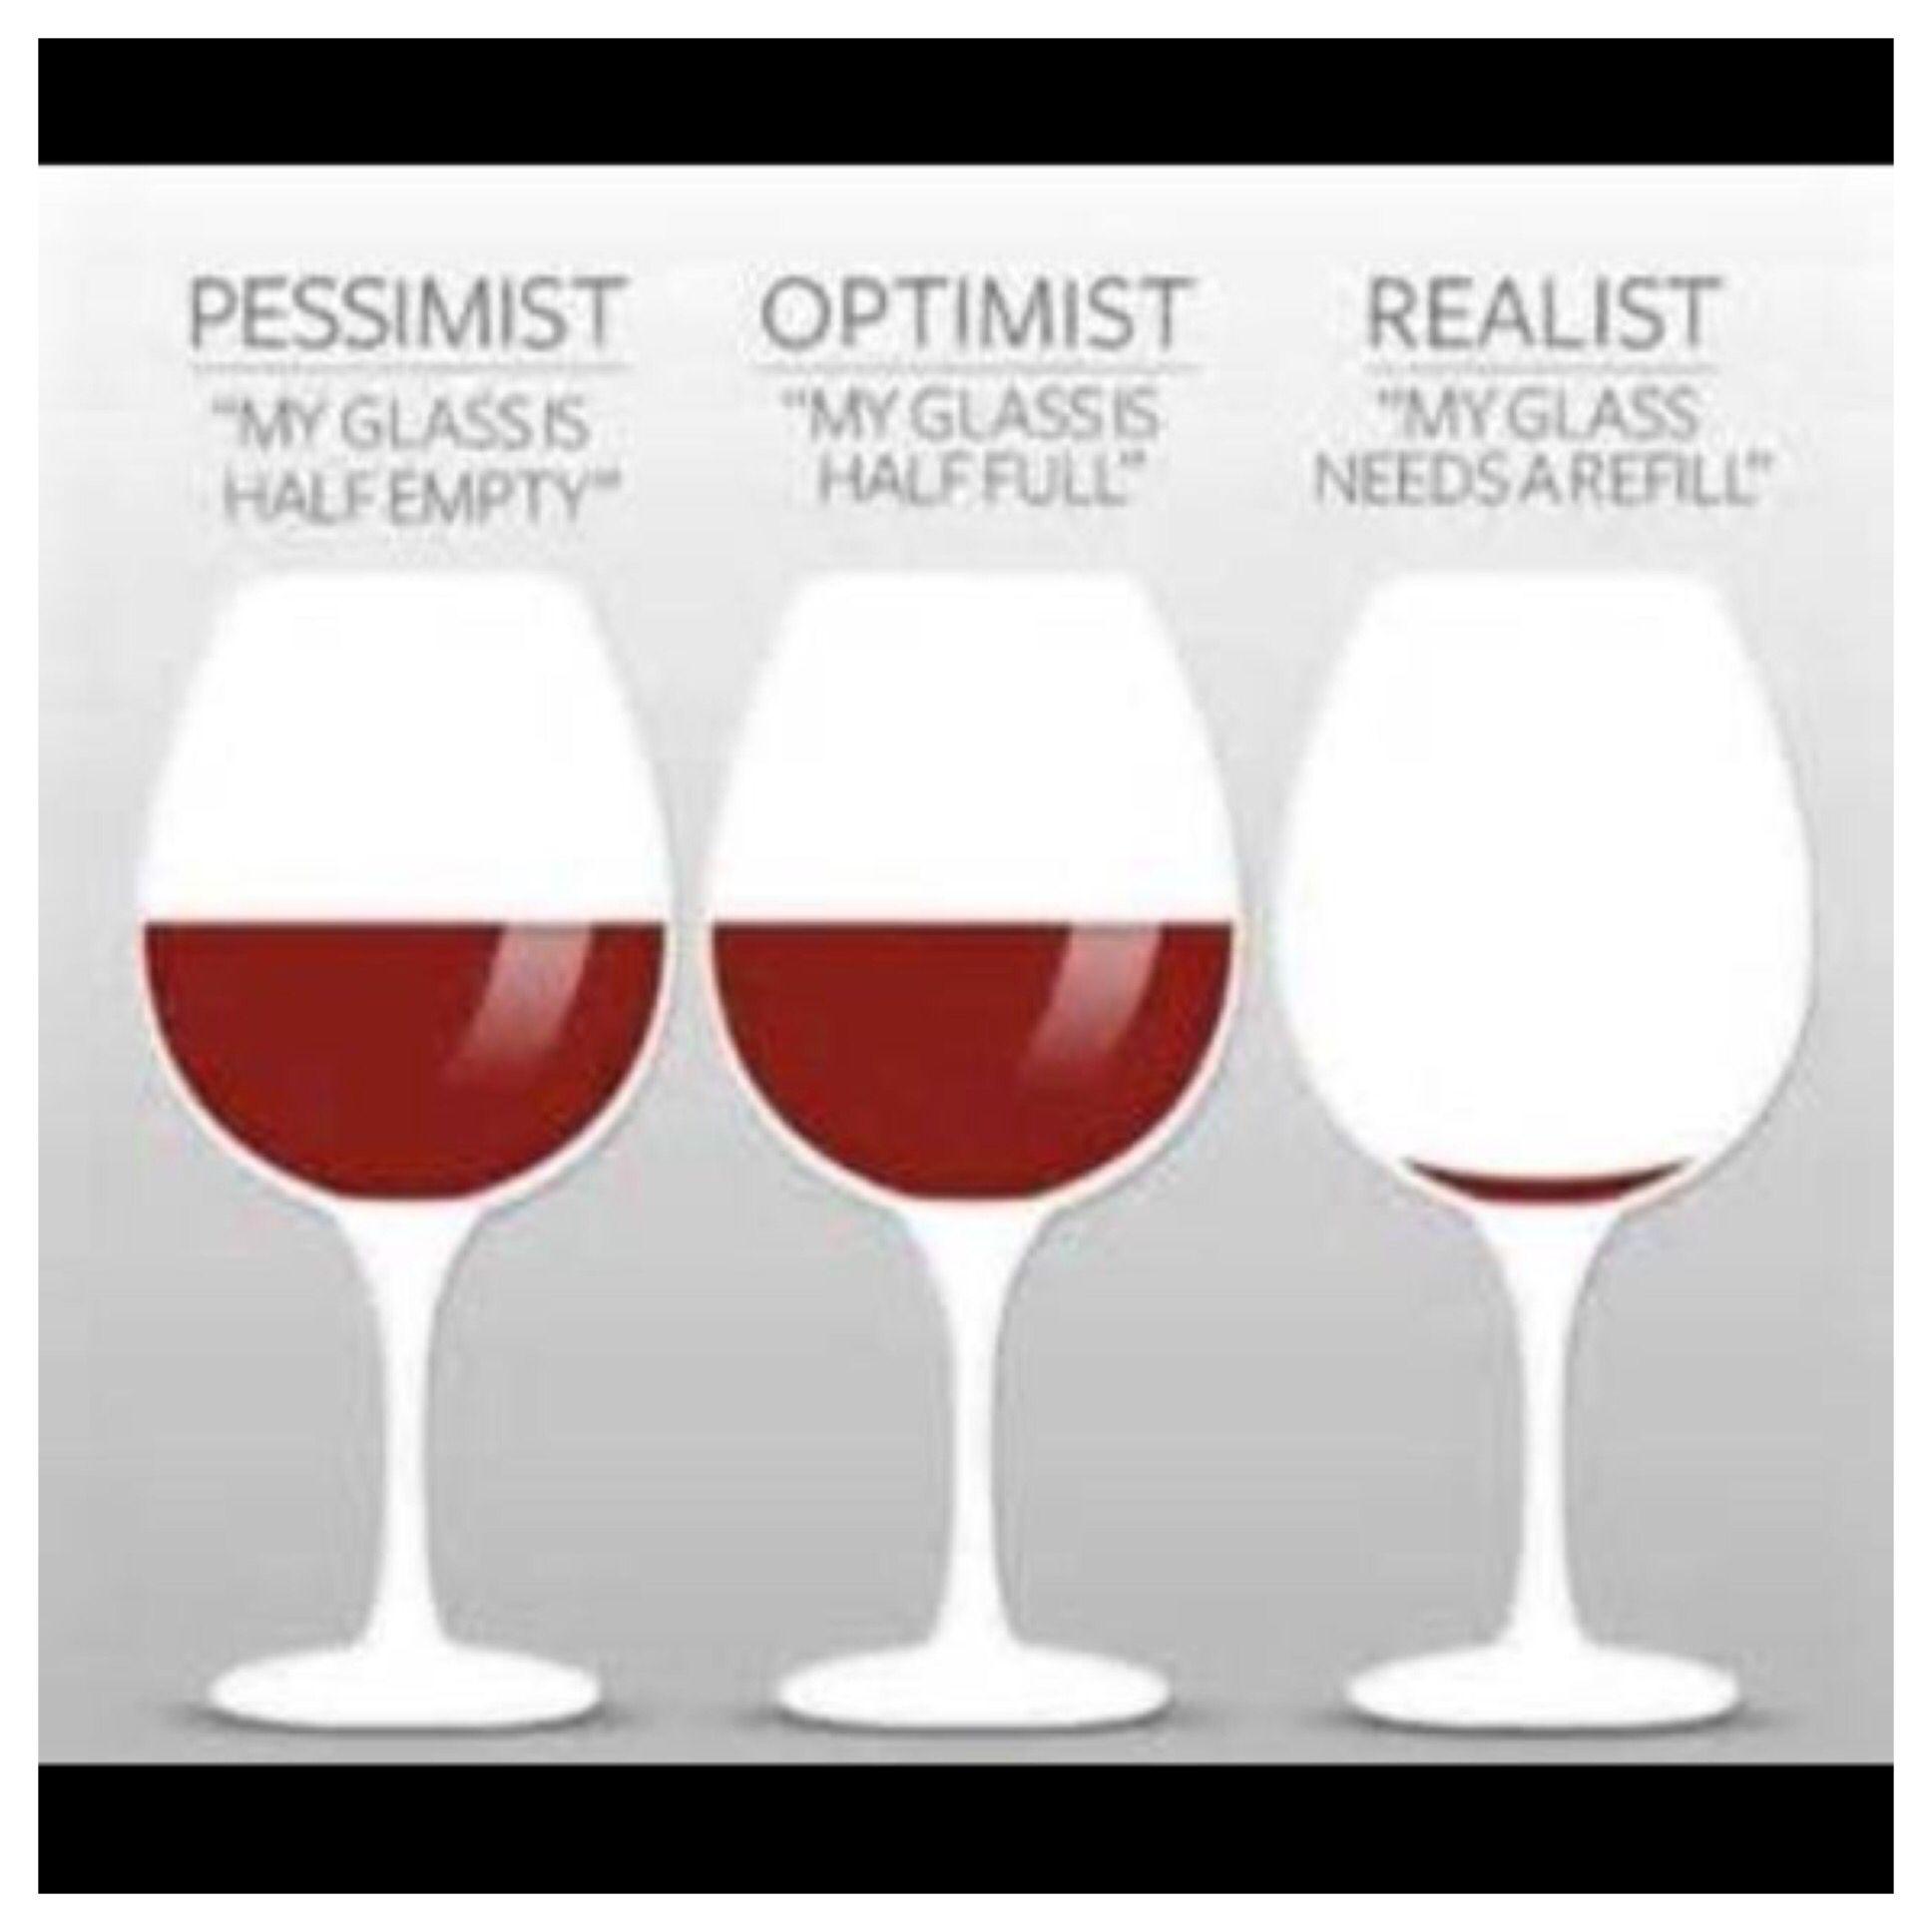 Pin By Satu On Wine Time Wine Jokes Wine Quotes Wine Meme